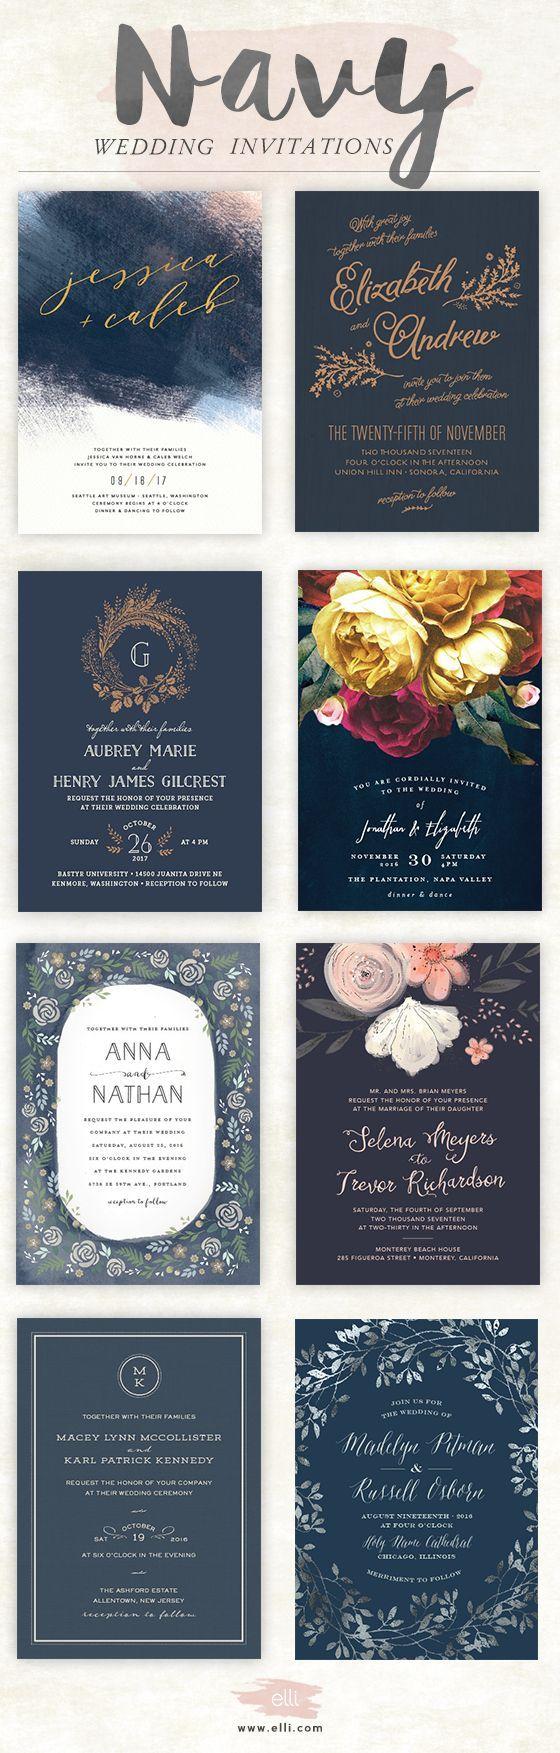 Now trending - navy wedding invitations from http://Elli.com